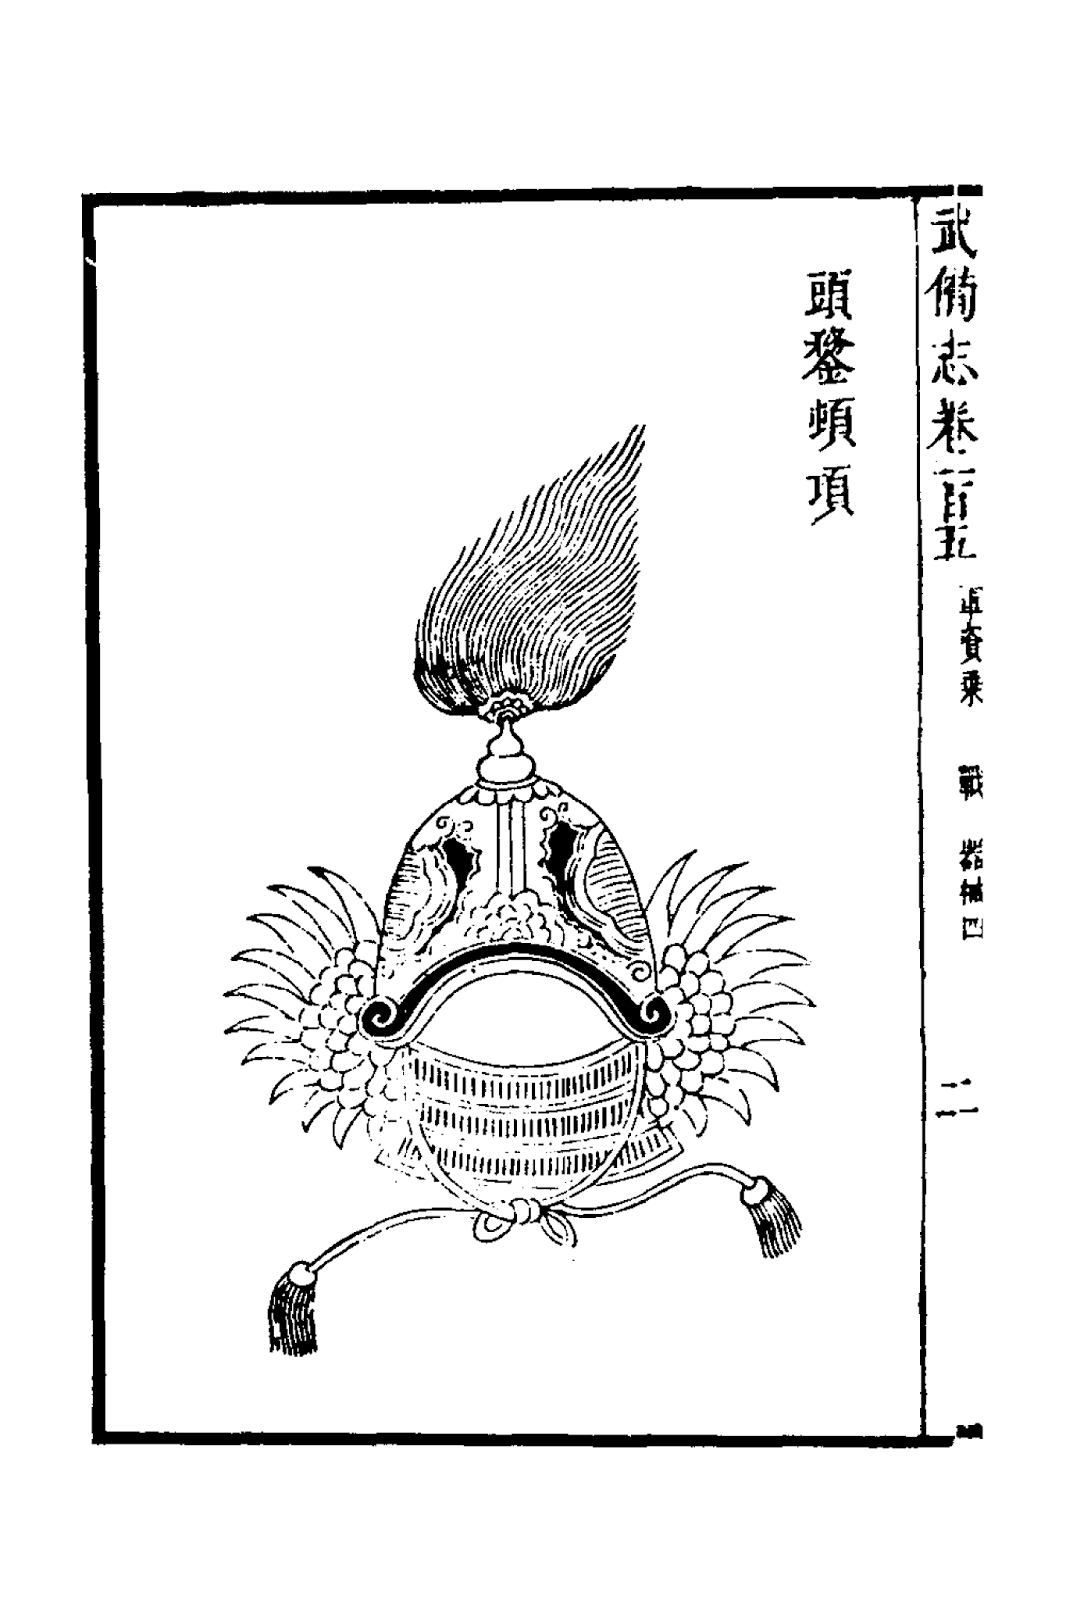 Ming Chinese Helmet